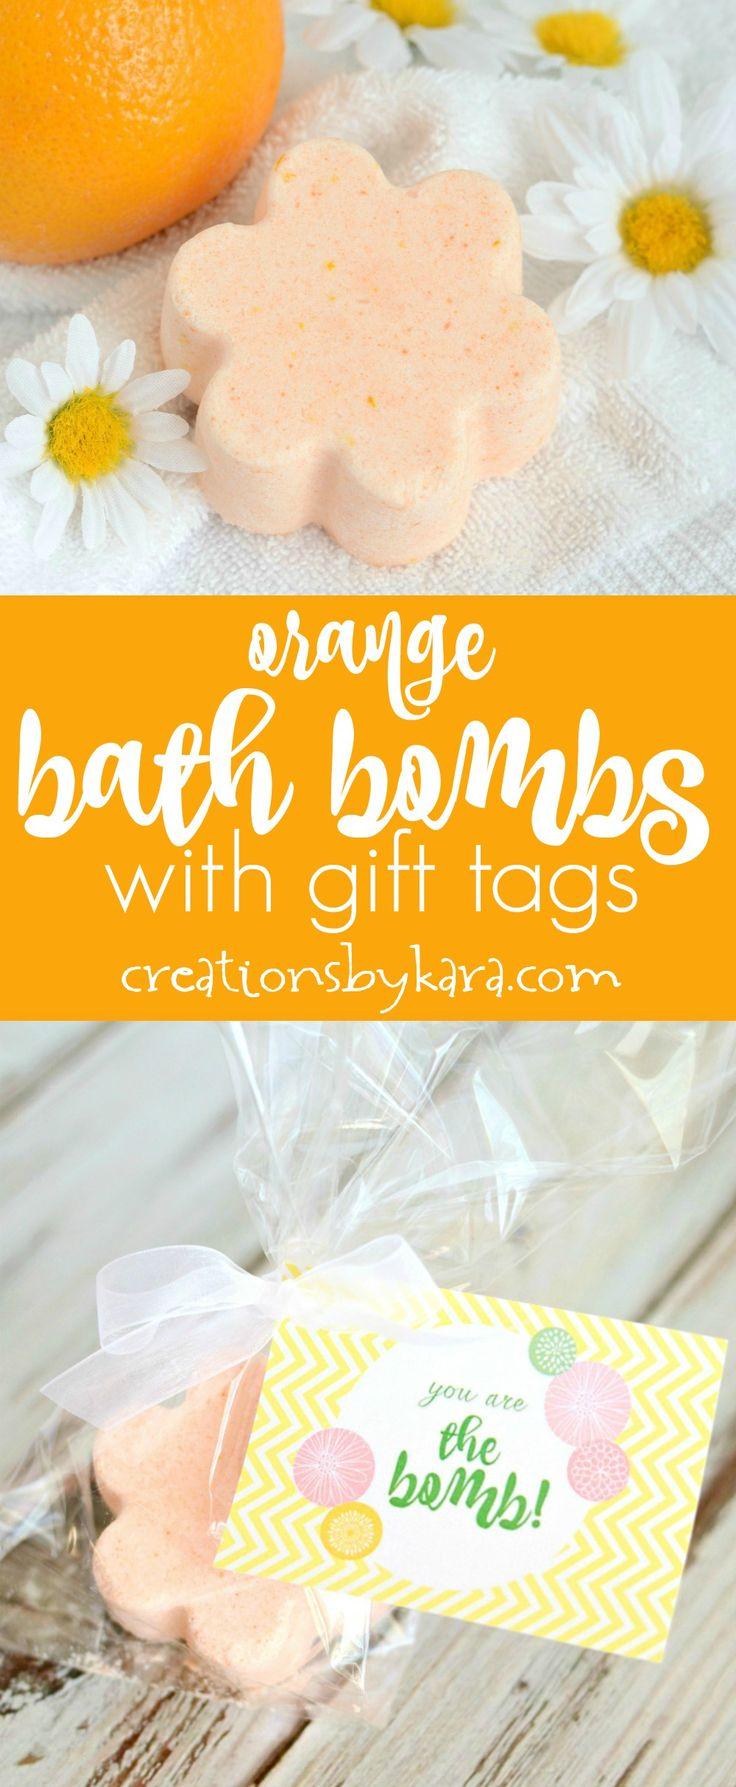 Orange Bath Bombs with free printable gift tags - homemade bath bombs make great gifts!